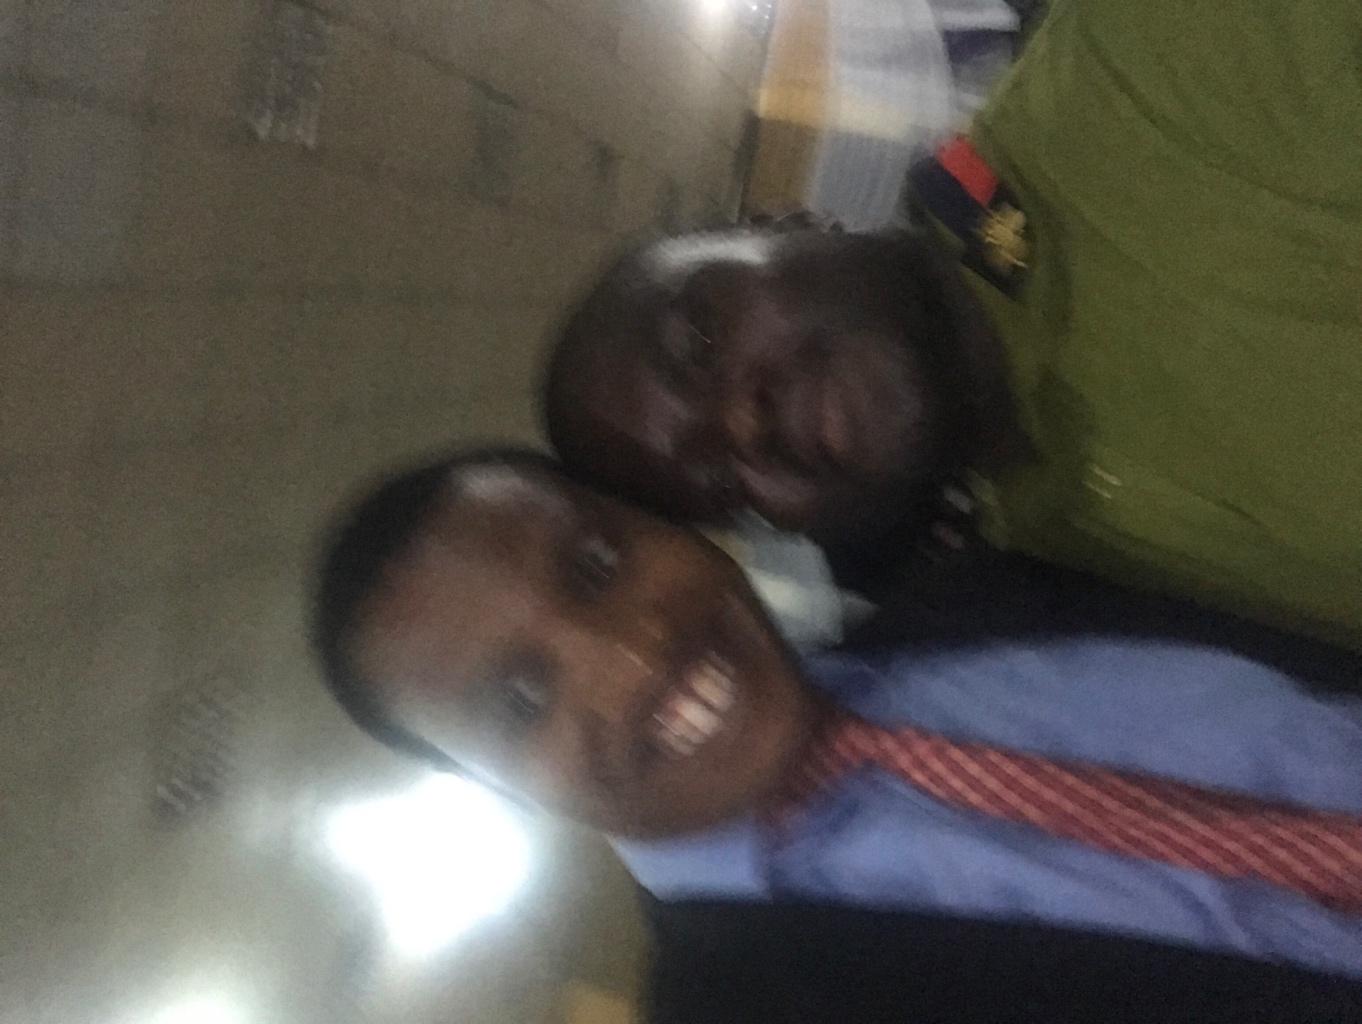 #pastorchrisontheisland #ceakilorocks #lagoszone5r